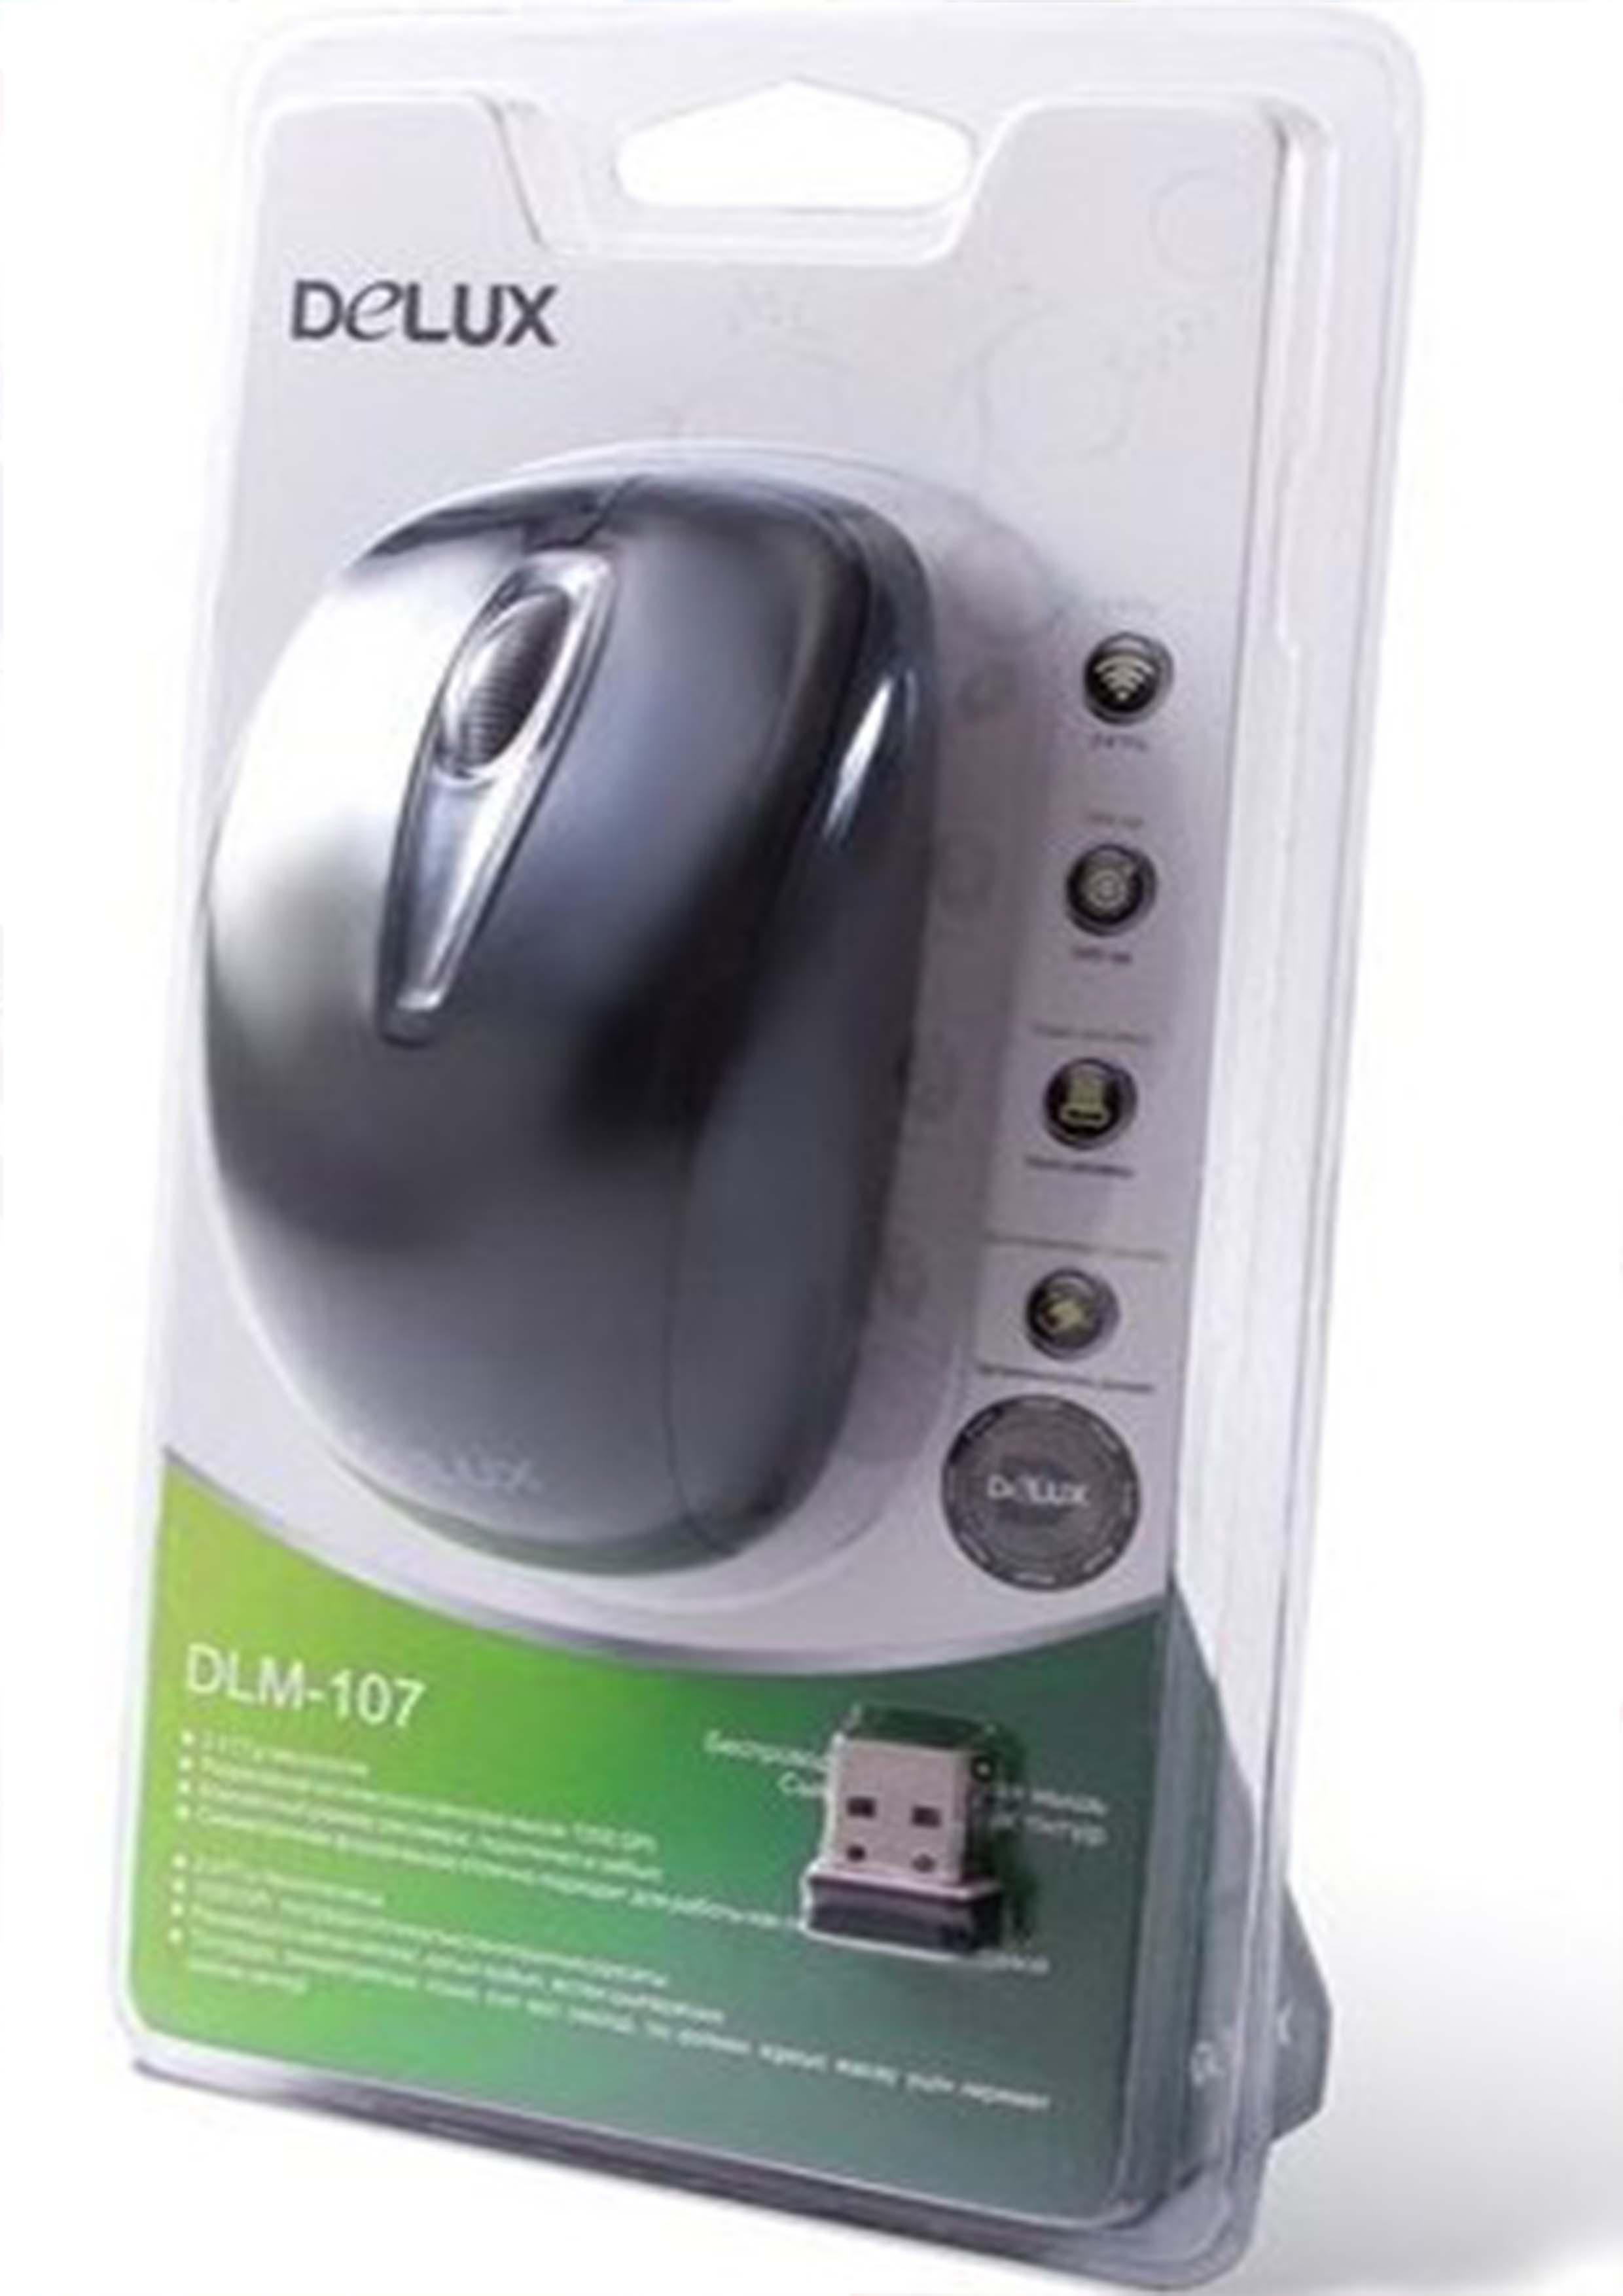 беспроводная мышка Delux DLM-107